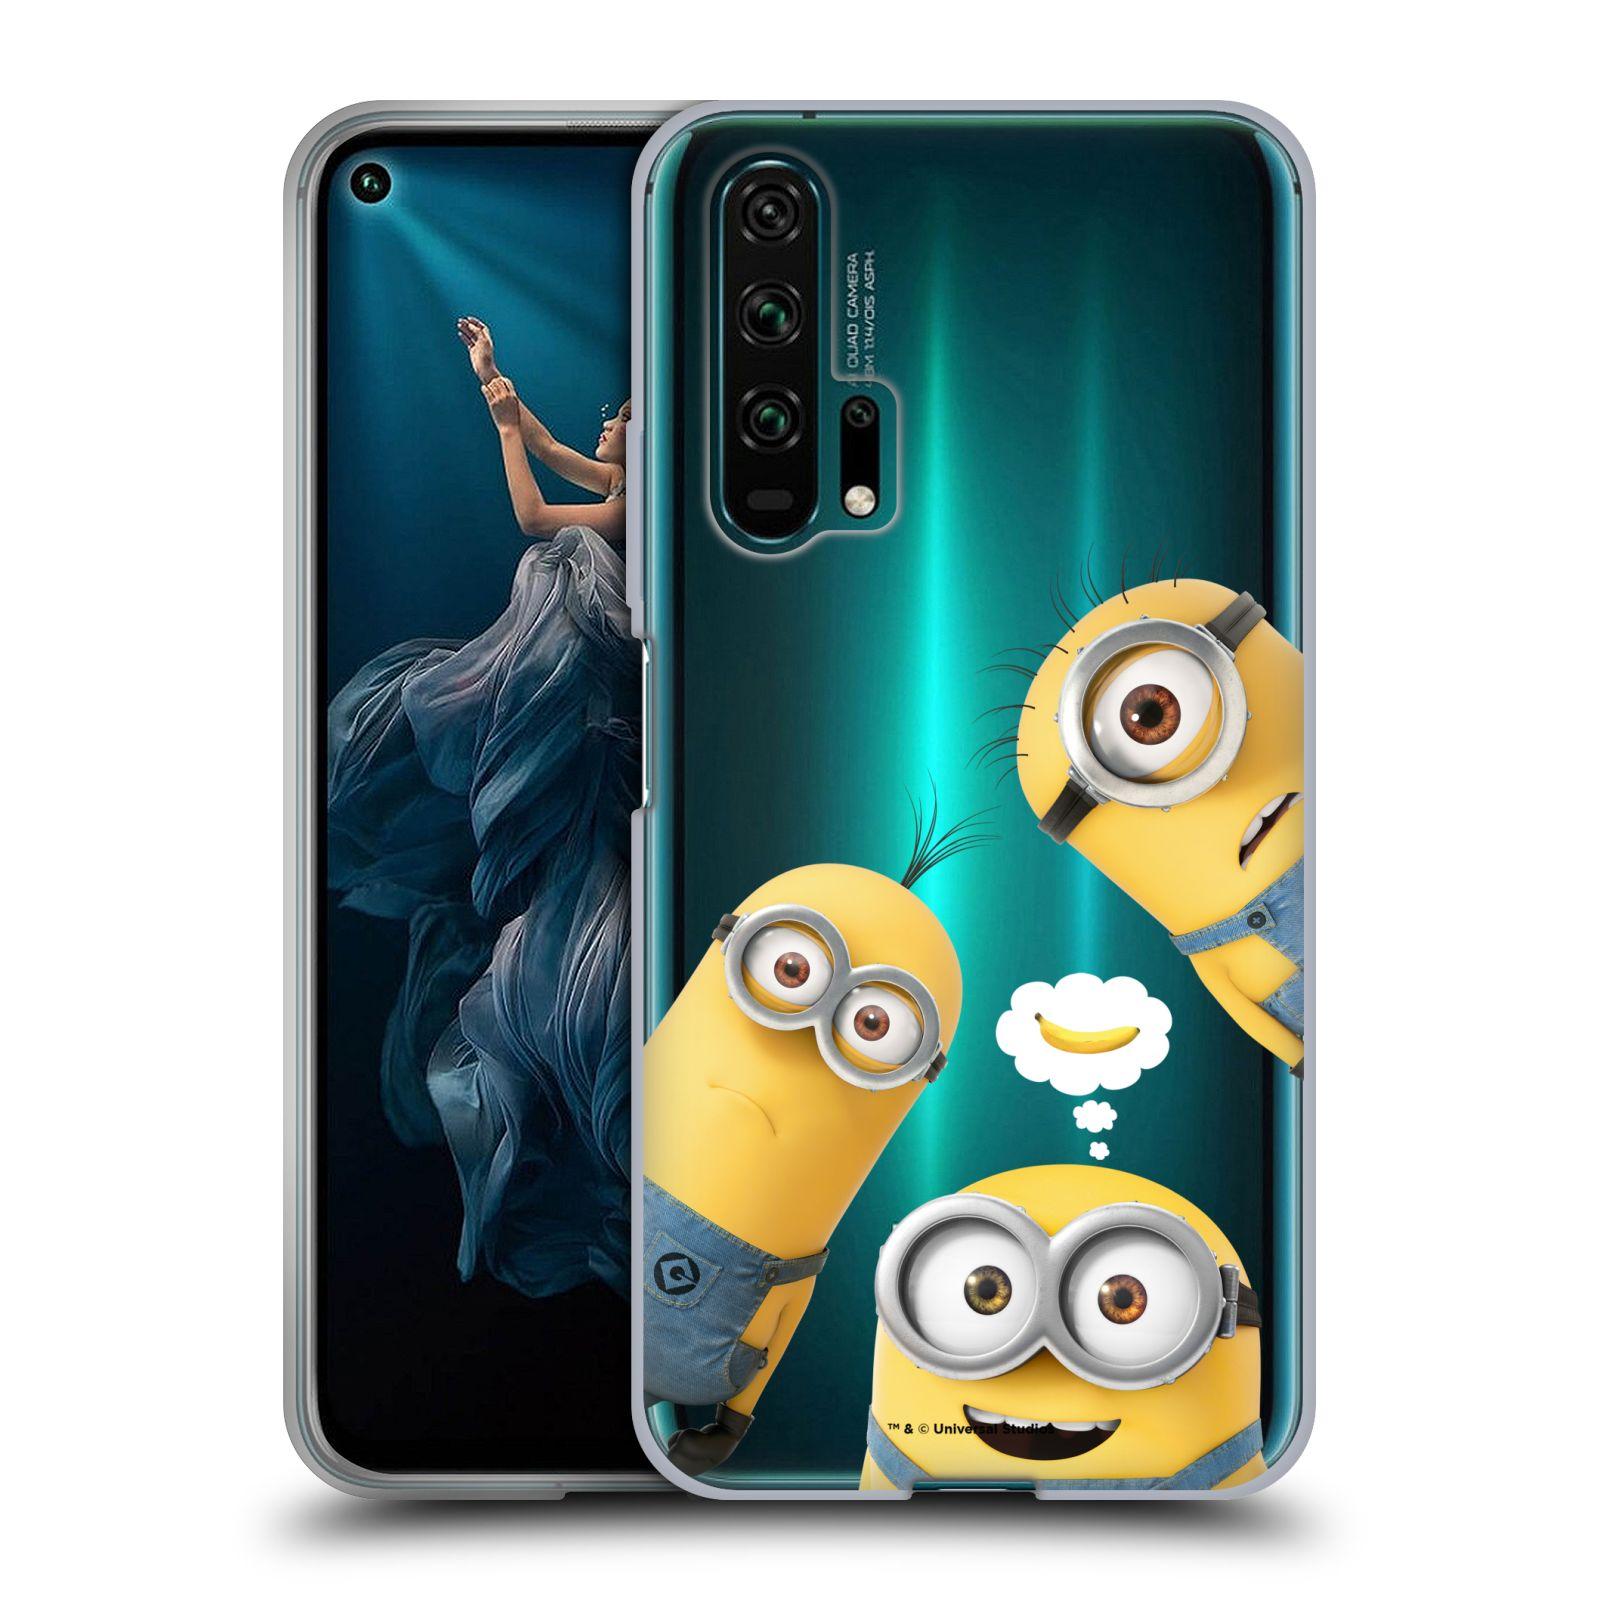 Silikonové pouzdro na mobil Honor 20 Pro - Head Case - Mimoni Banana z filmu Já, padouch - Despicable Me